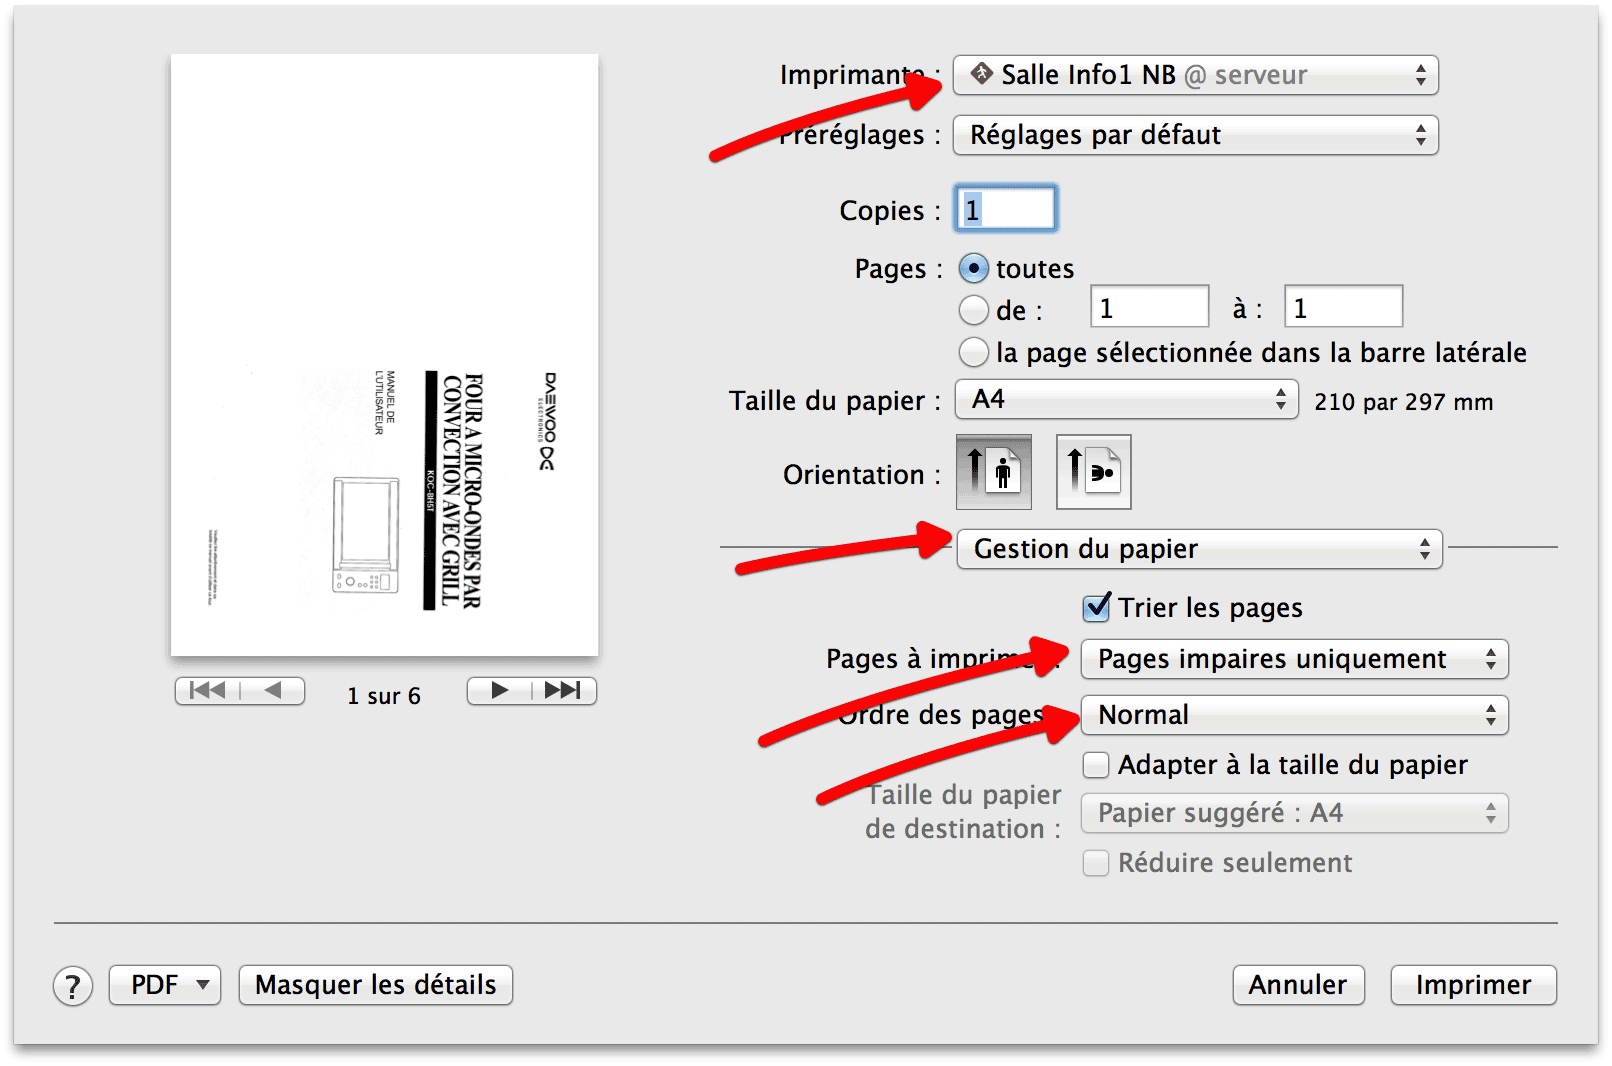 Pages impaires